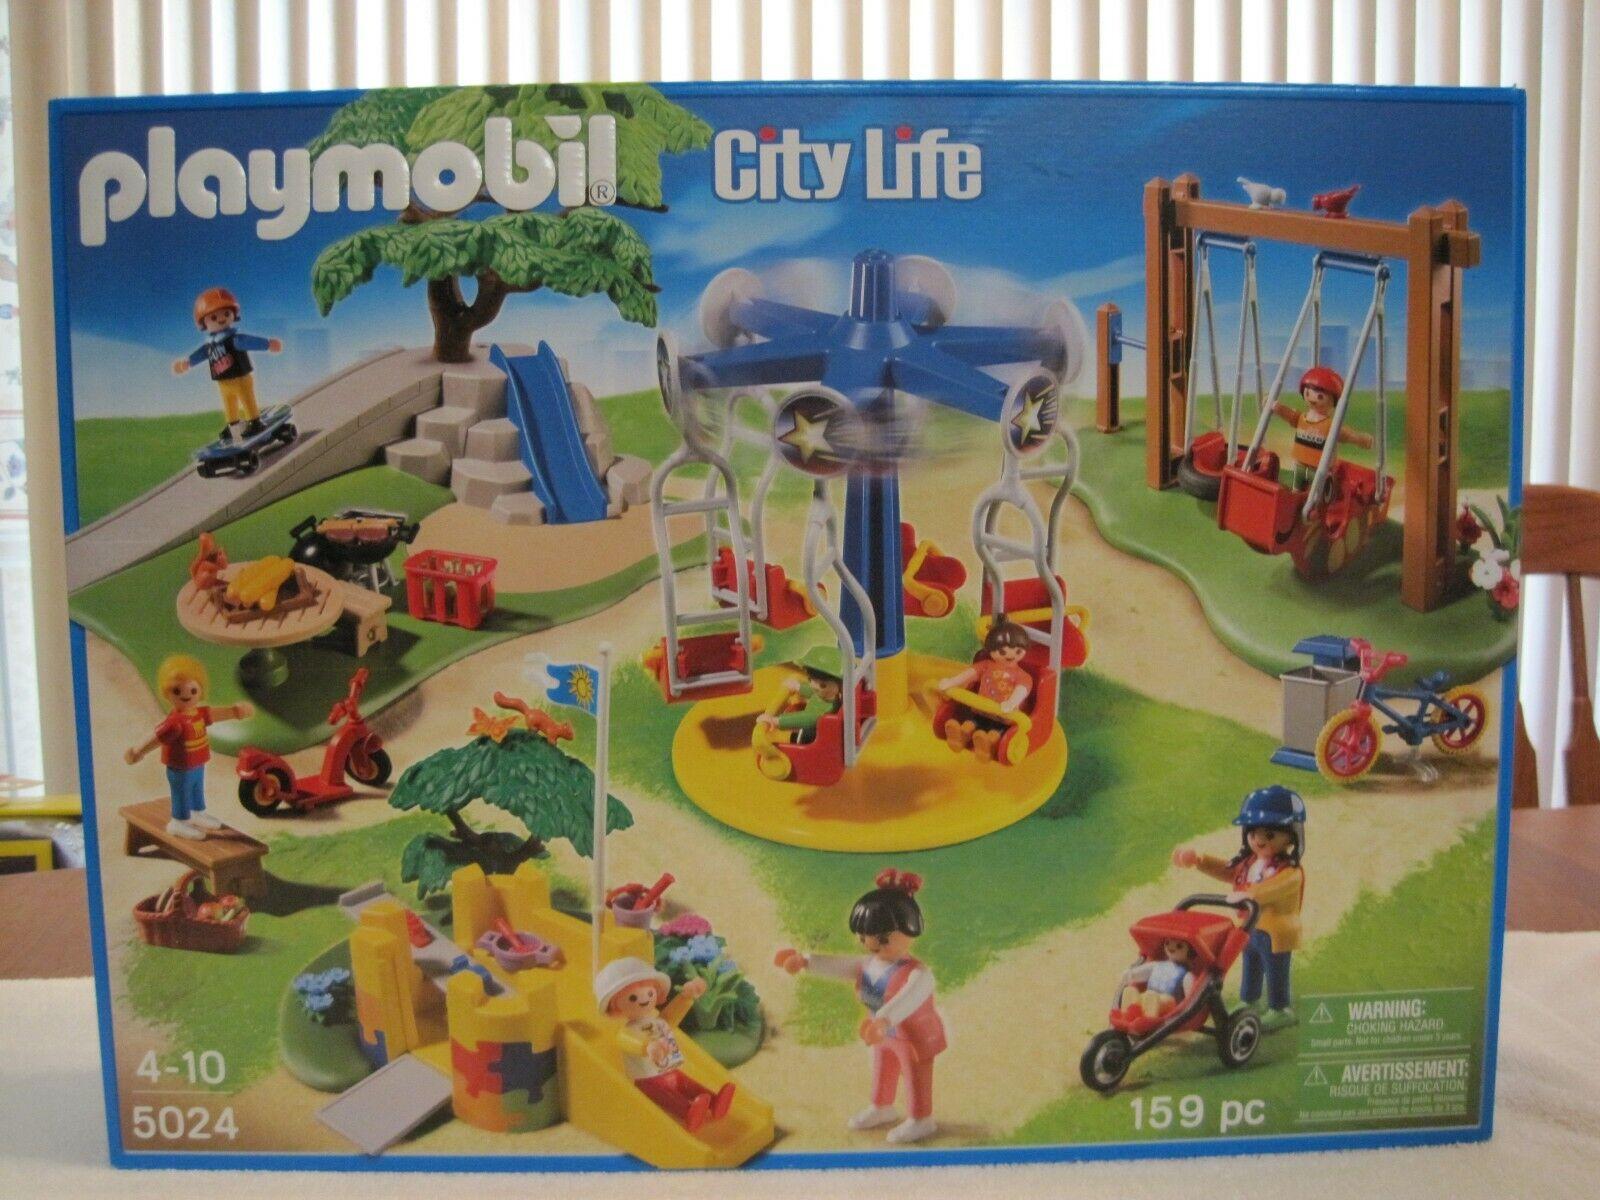 Playmobil 5024 City Life Playground -- NEW -- FACTORY SEALED